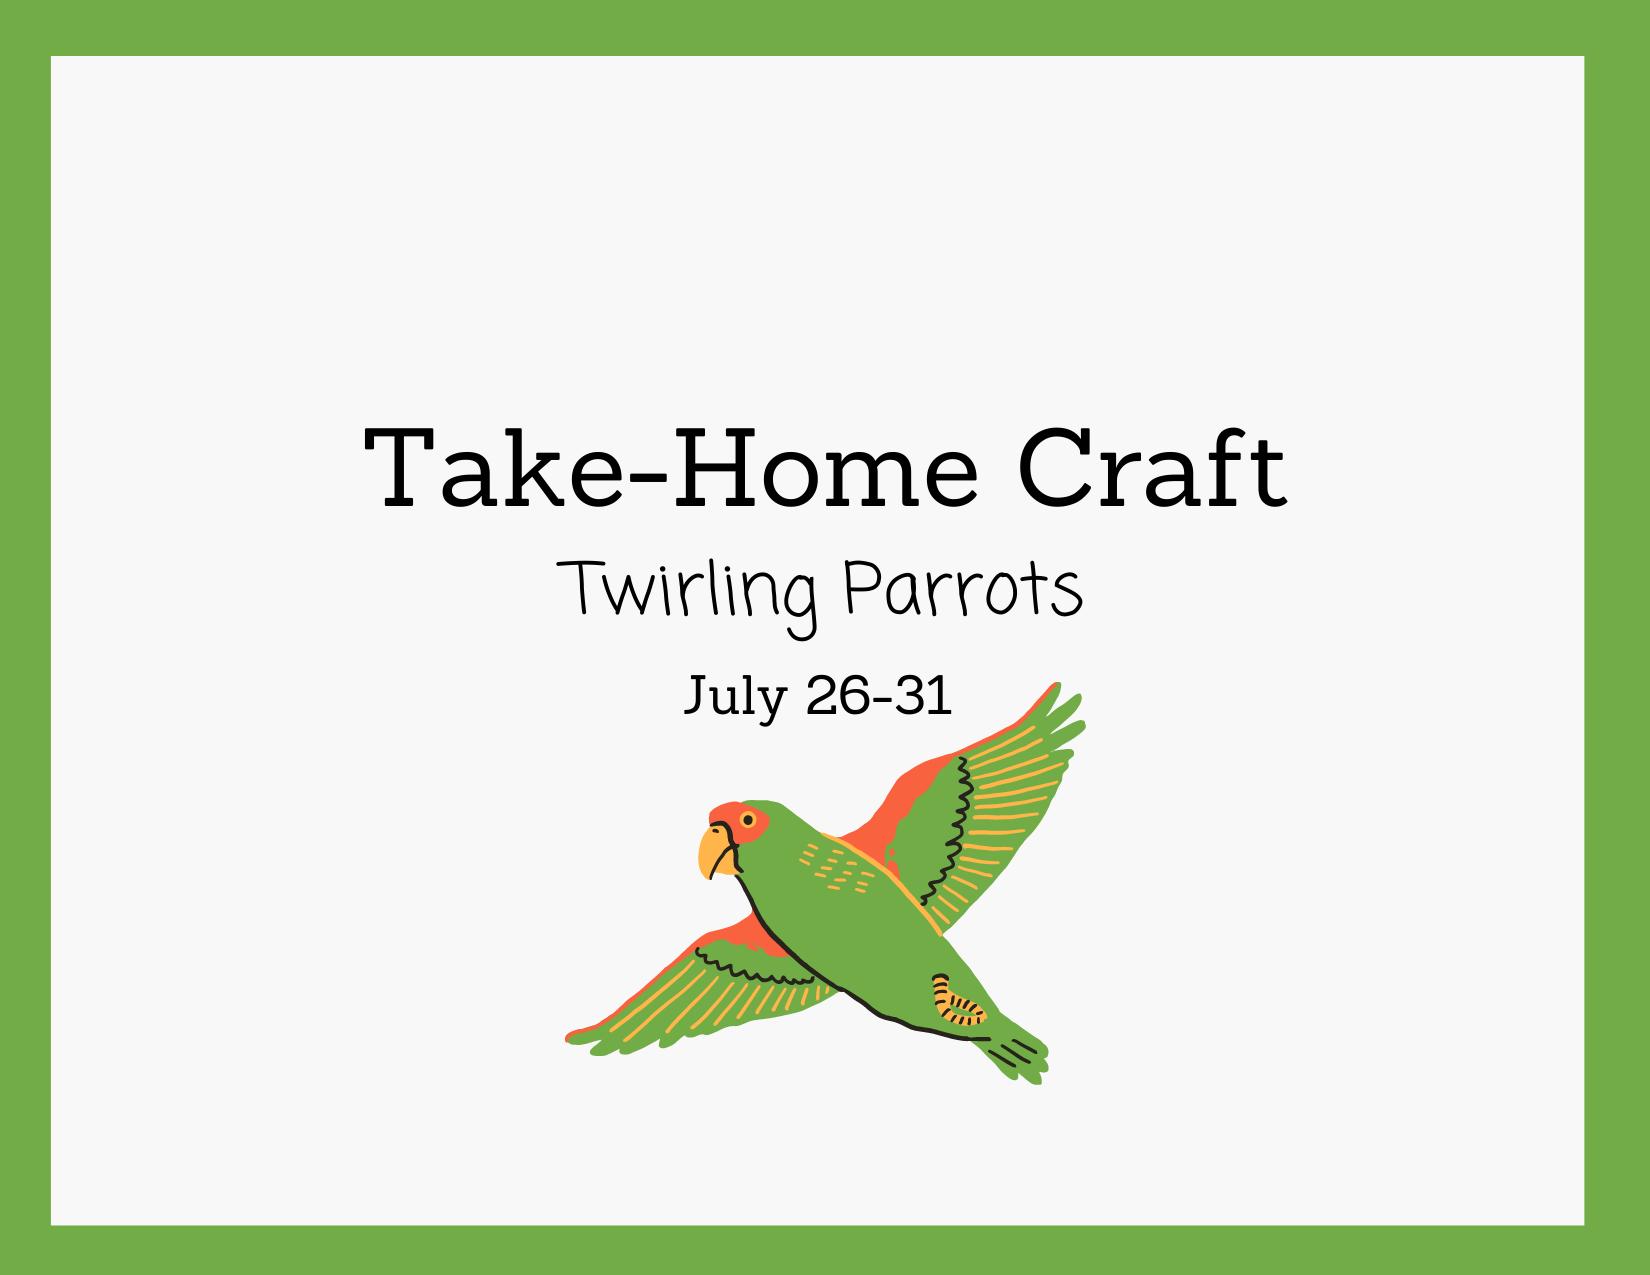 Take-Home Craft | July 26-31